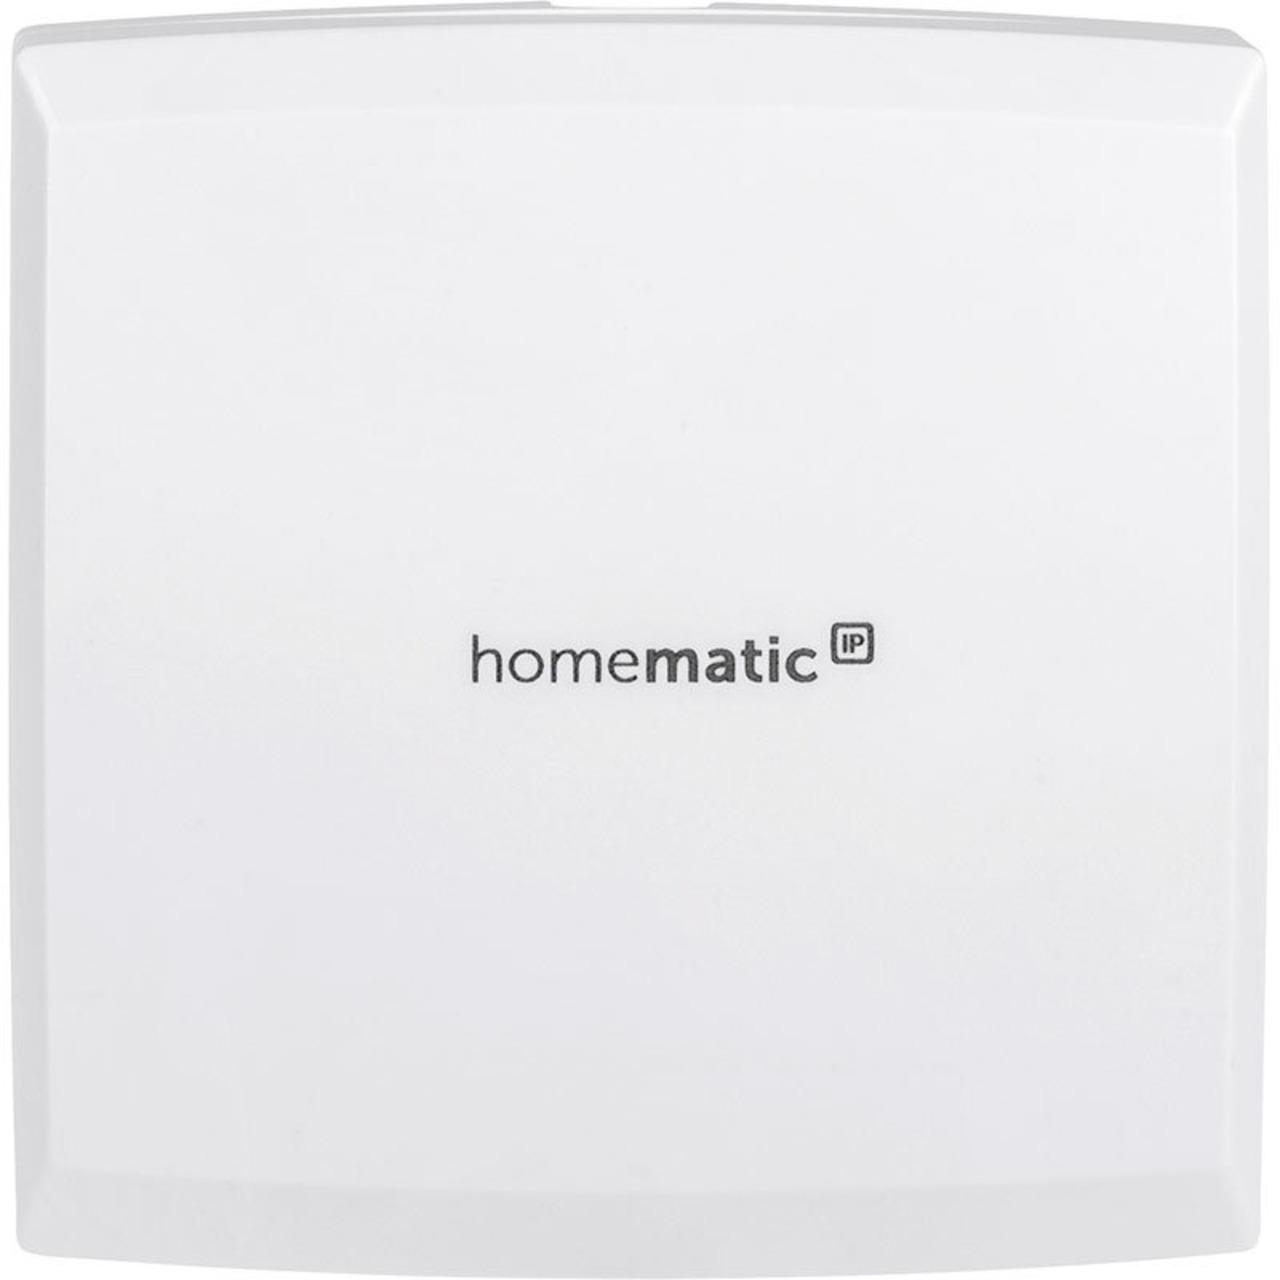 ELV Homematic IP Bausatz Garagentortaster-Schaltaktor HmIP-WGC- fernbedienbar